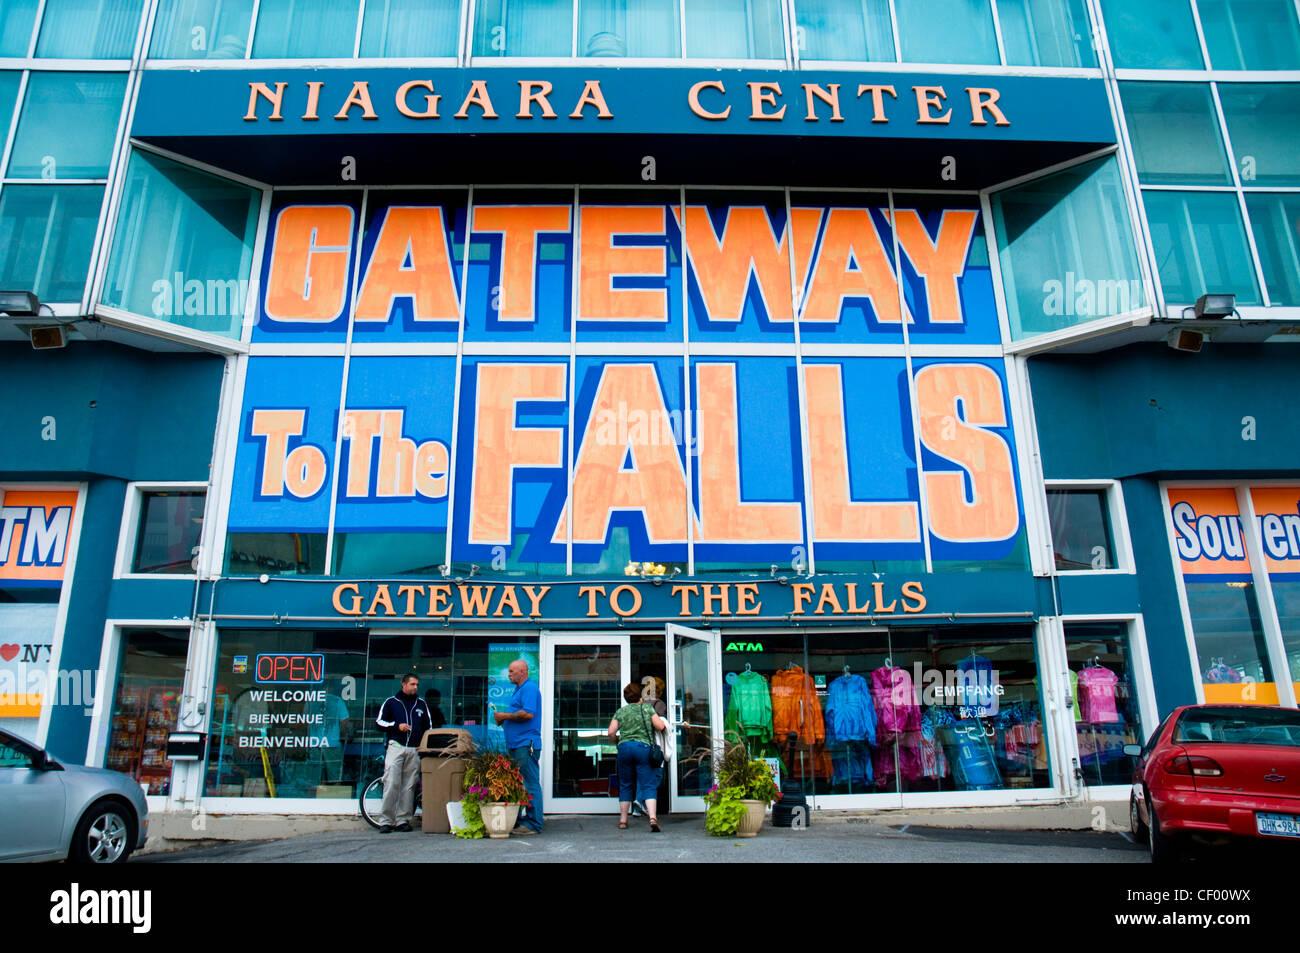 The Niagara Centre, a large shop and food court at Niagara Falls - Stock Image